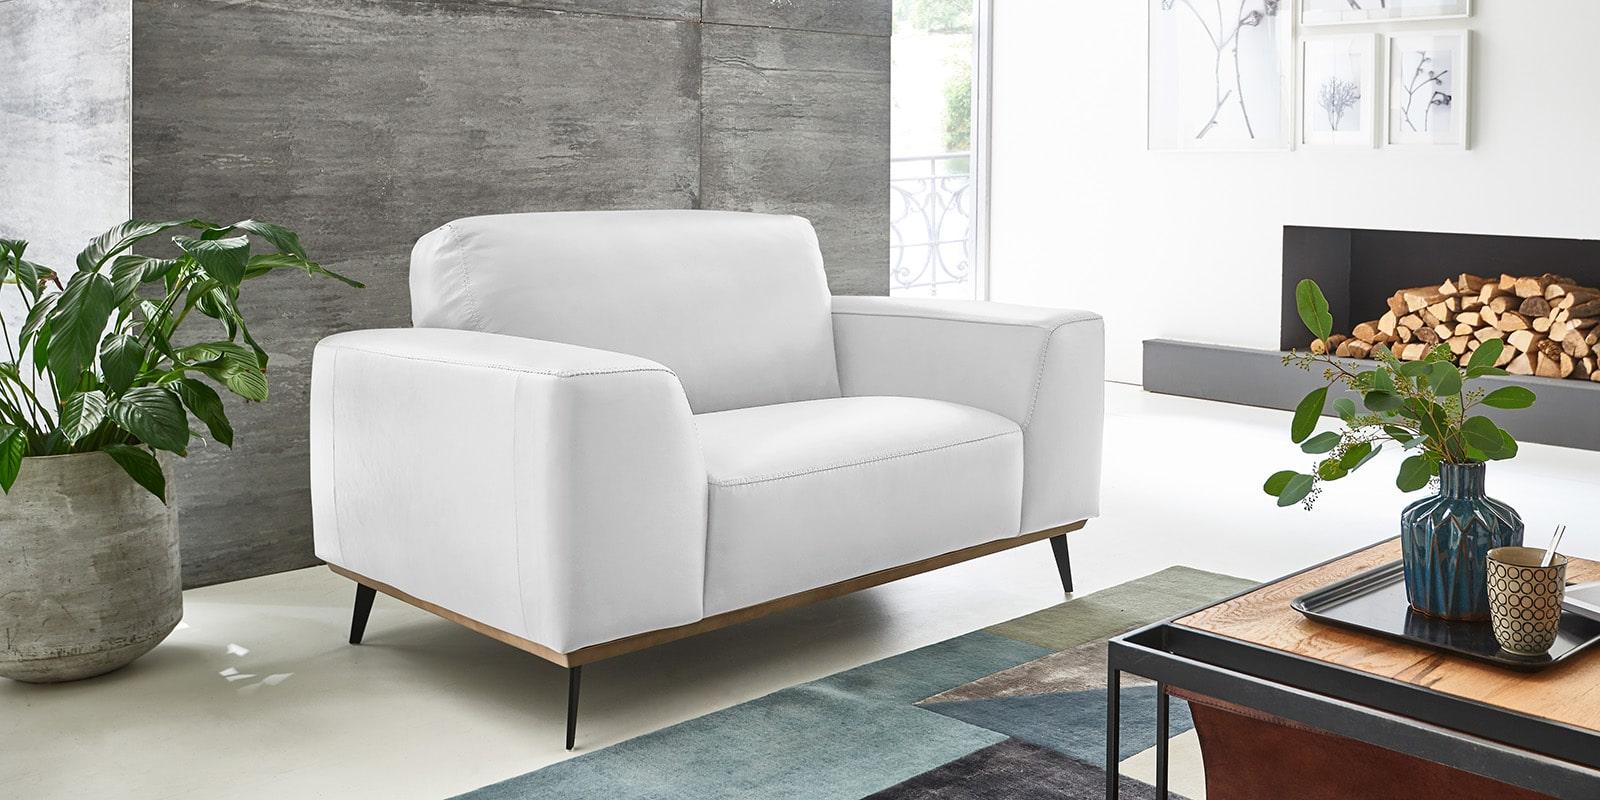 Moebella24 - 1,5-Sitzer - Sessel - Sofa - Barcelona - Leder - Weiß - Skandinavisches - Design - Punto - cavallo - Nähte - Elegante - Füße